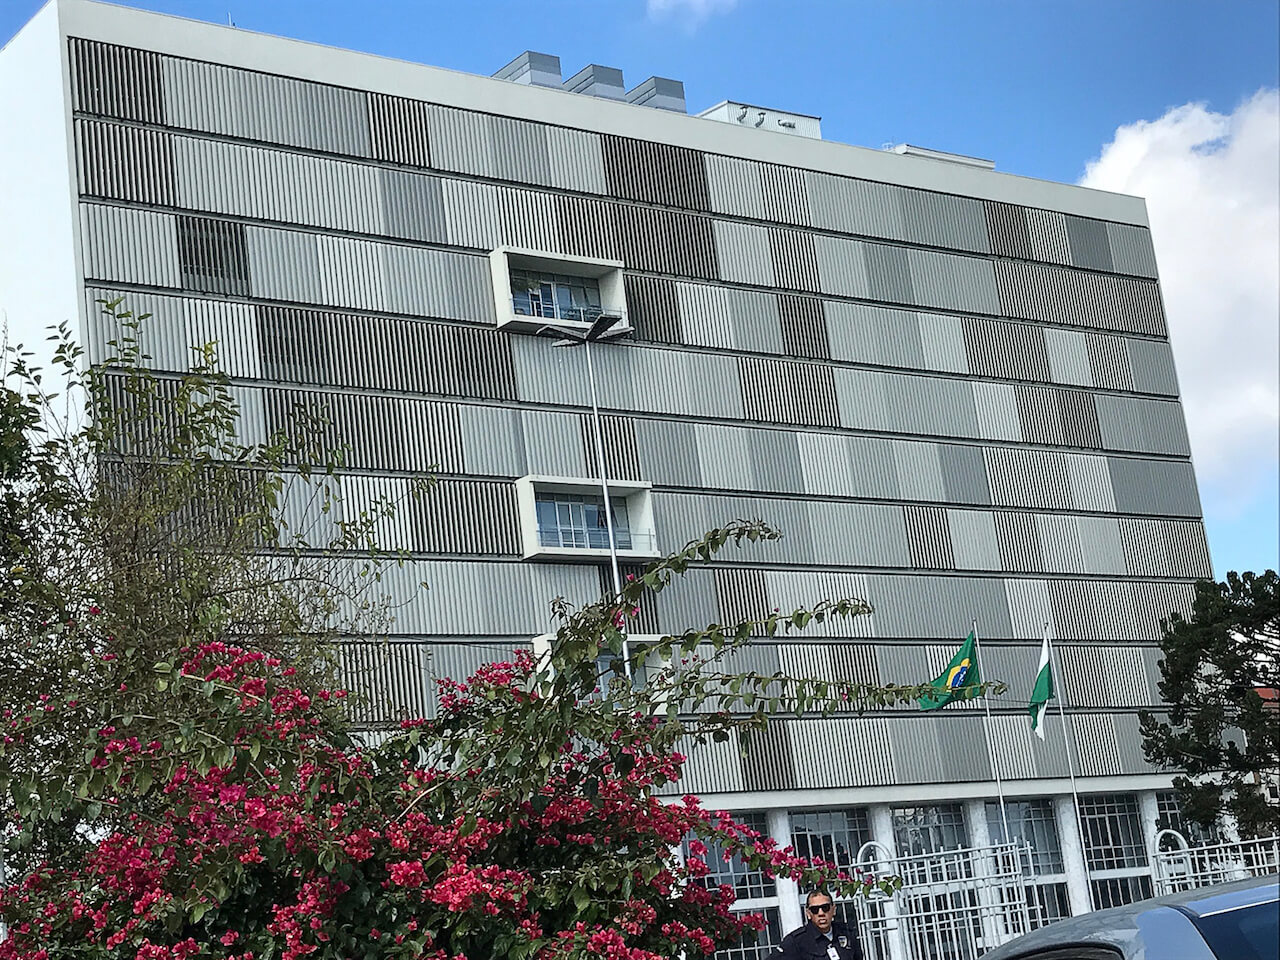 Tribunal de Justiça do Paraná - Curitiba/PR